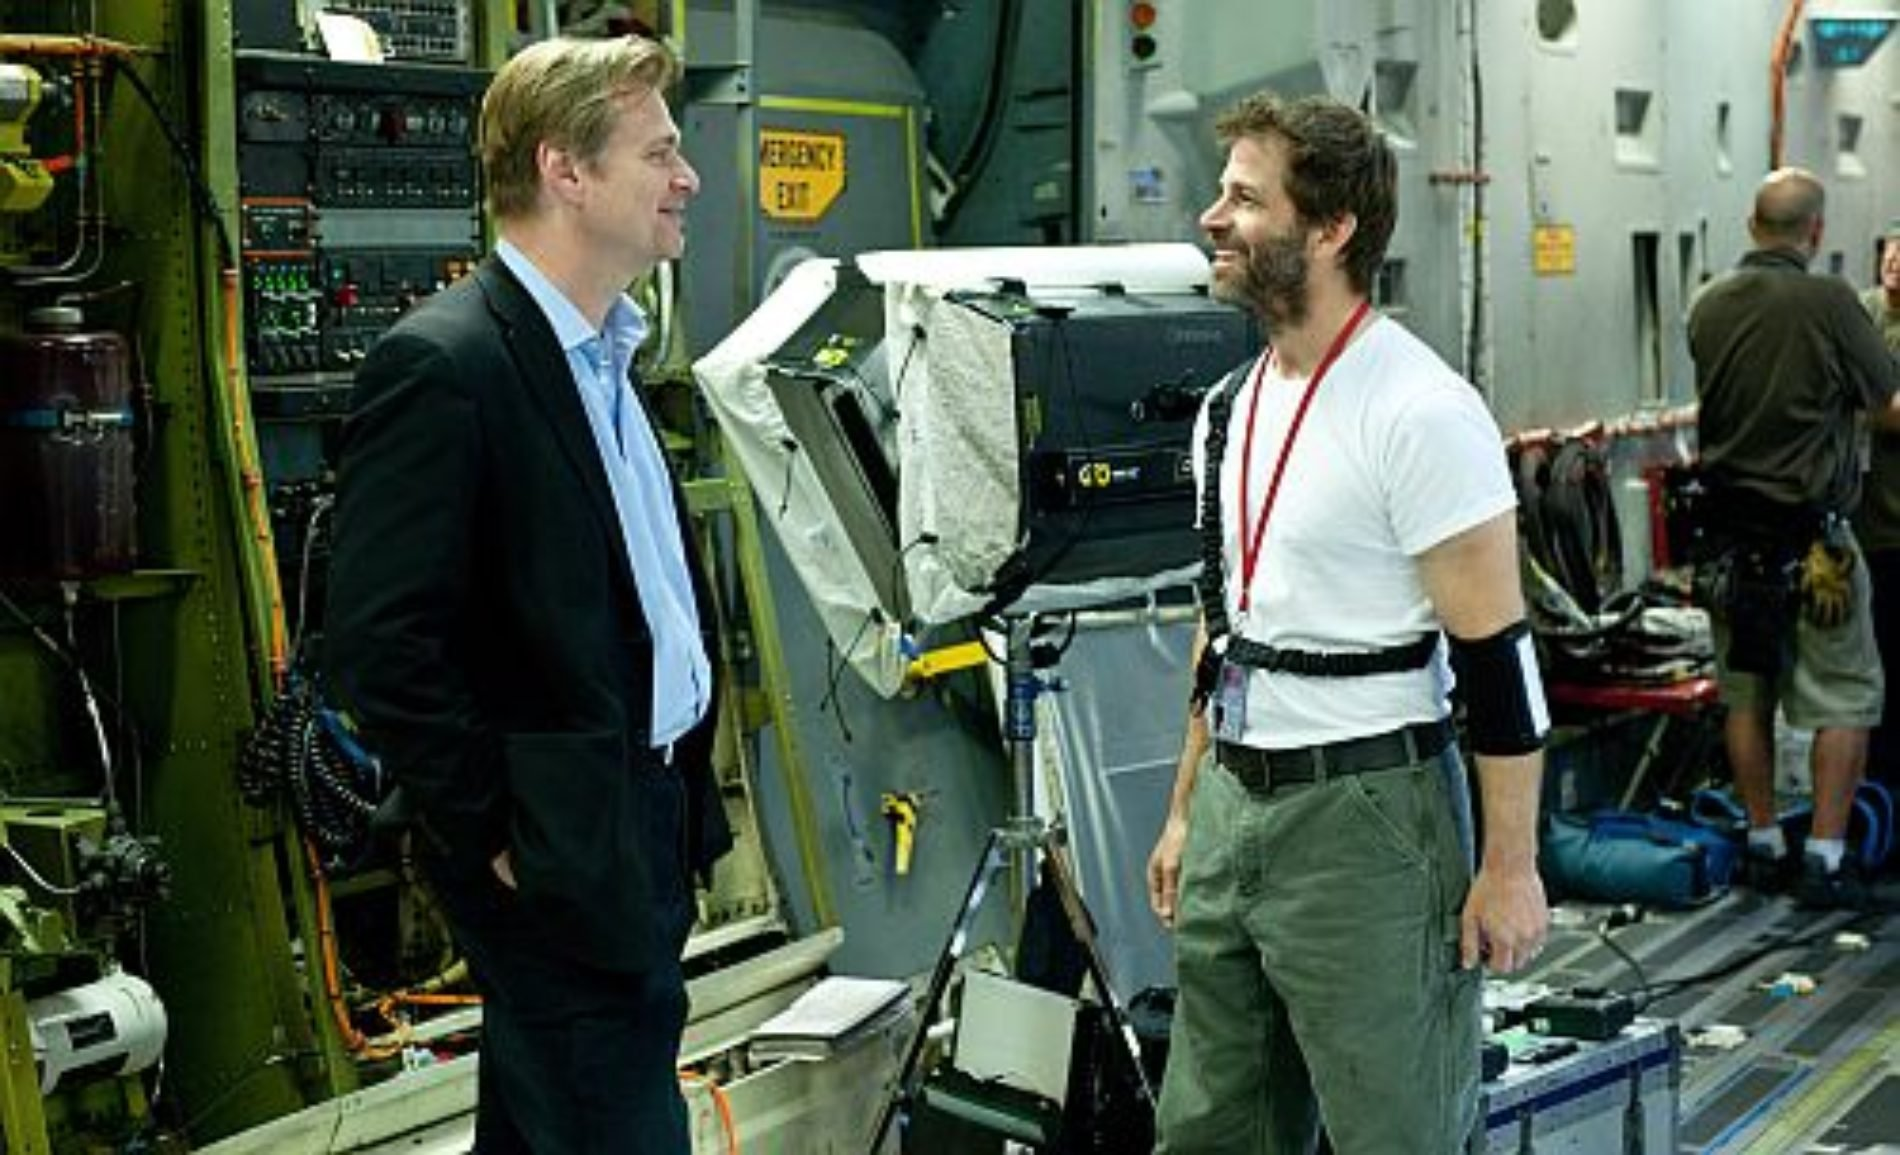 Christopher Nolan la bendición de Zack Snyder para 'Batman v Superman'